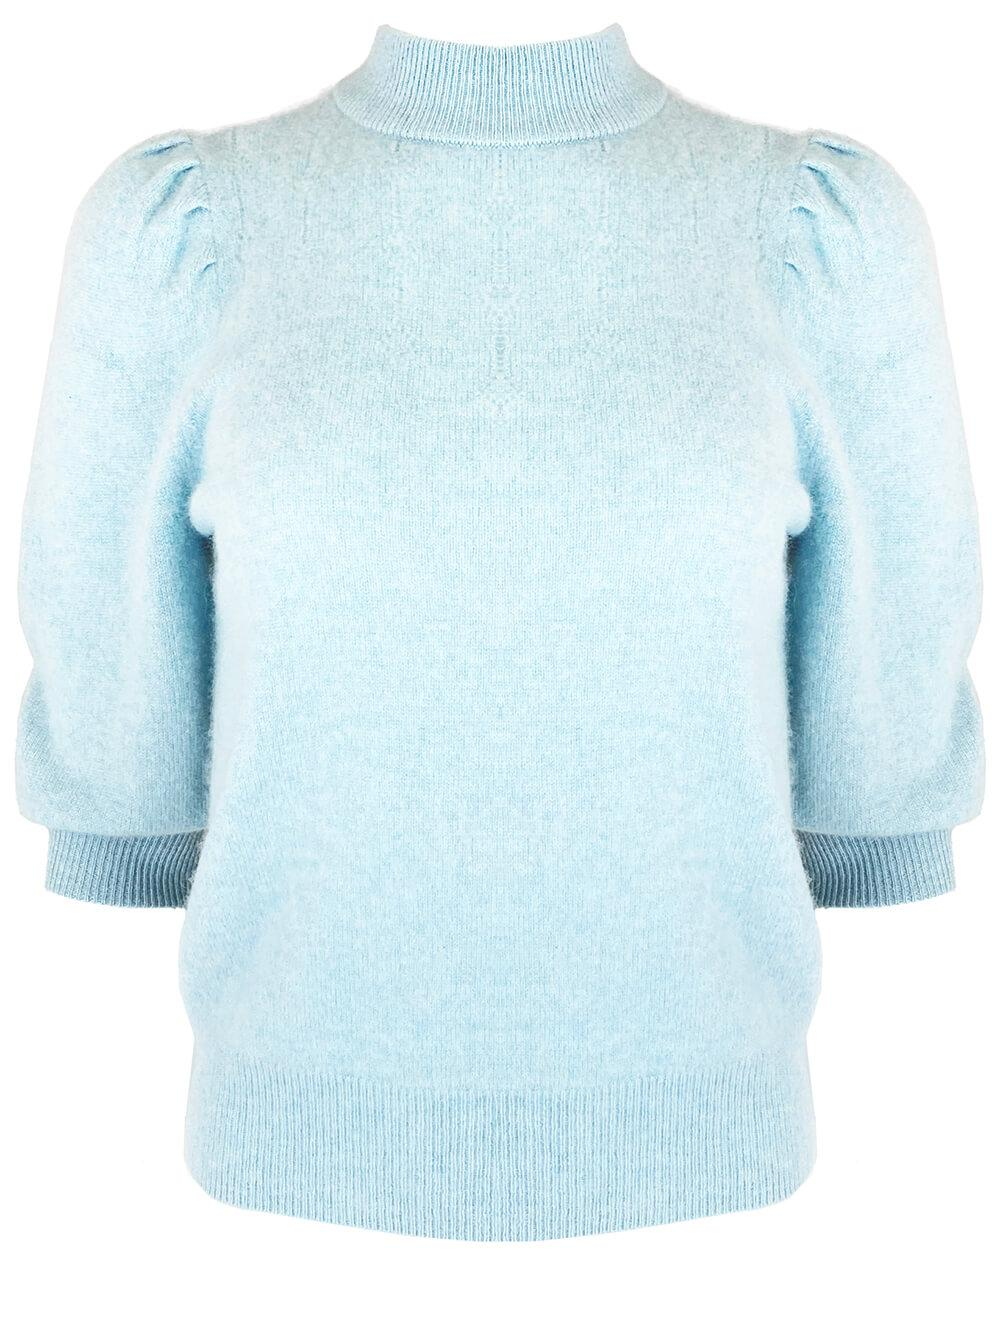 Rhoslyn Cashmere Sweater